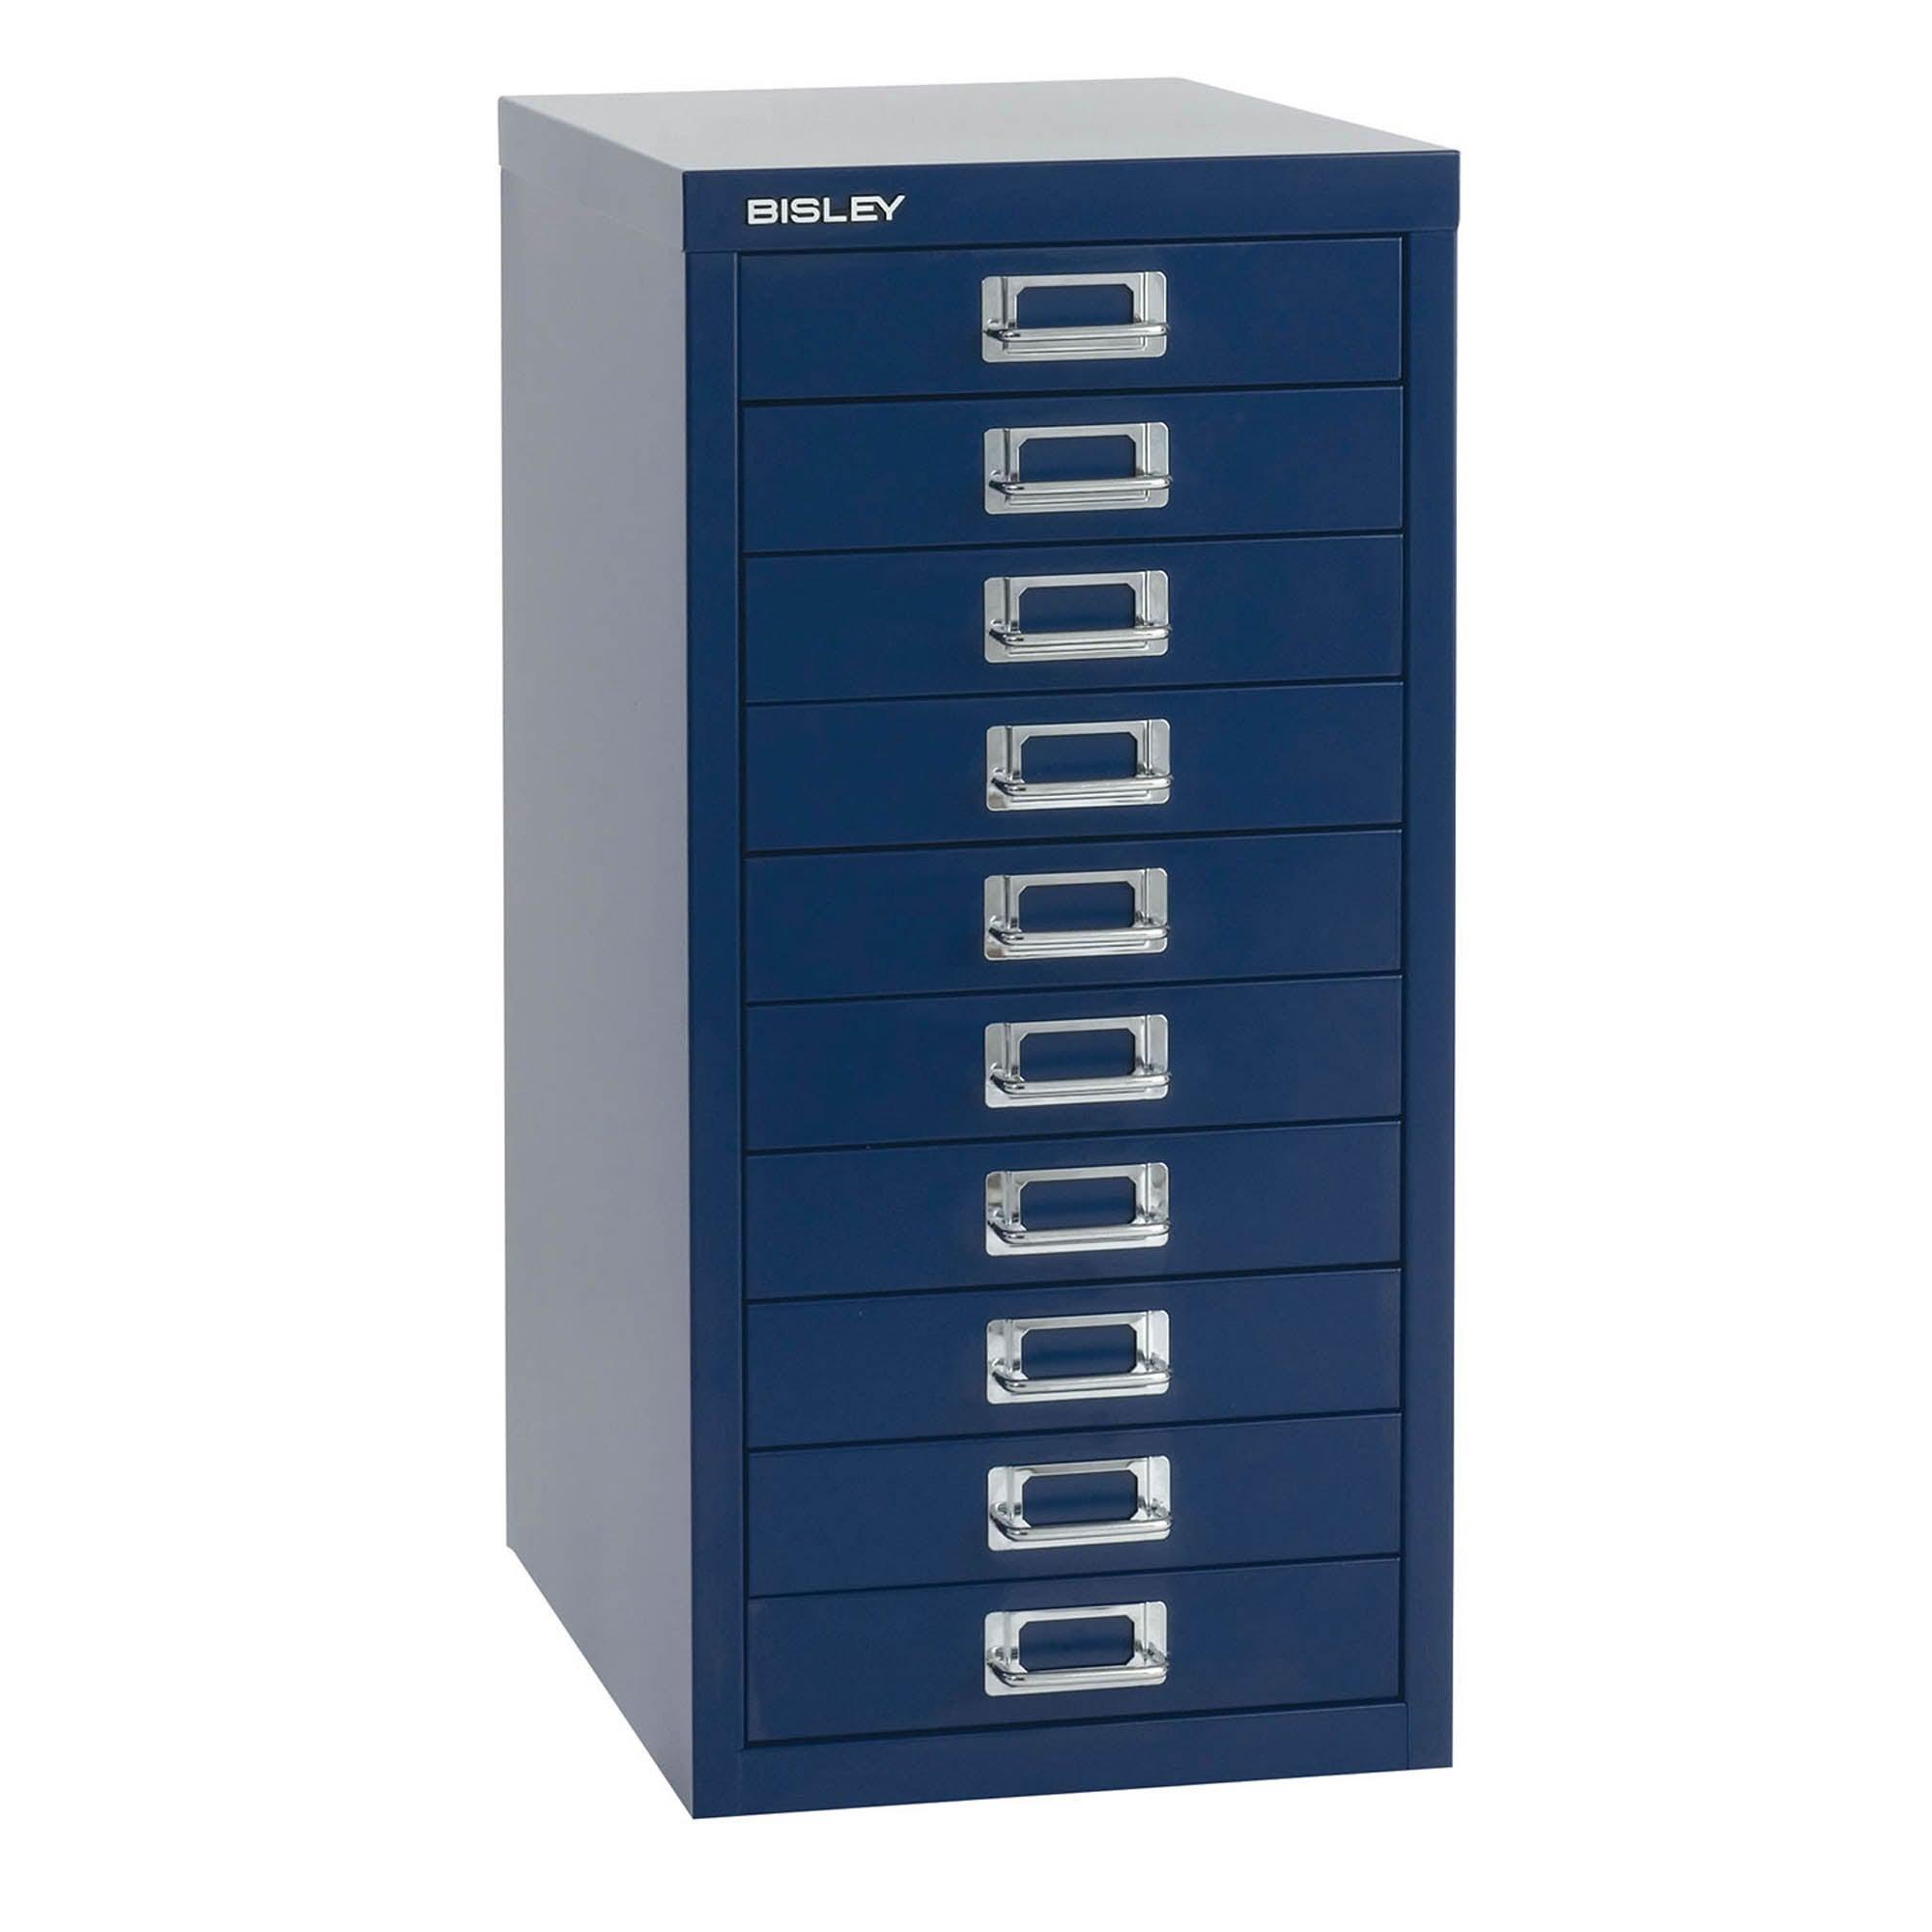 Bisley Metal 10 Drawer Filing Cabinet Navy (Blue)